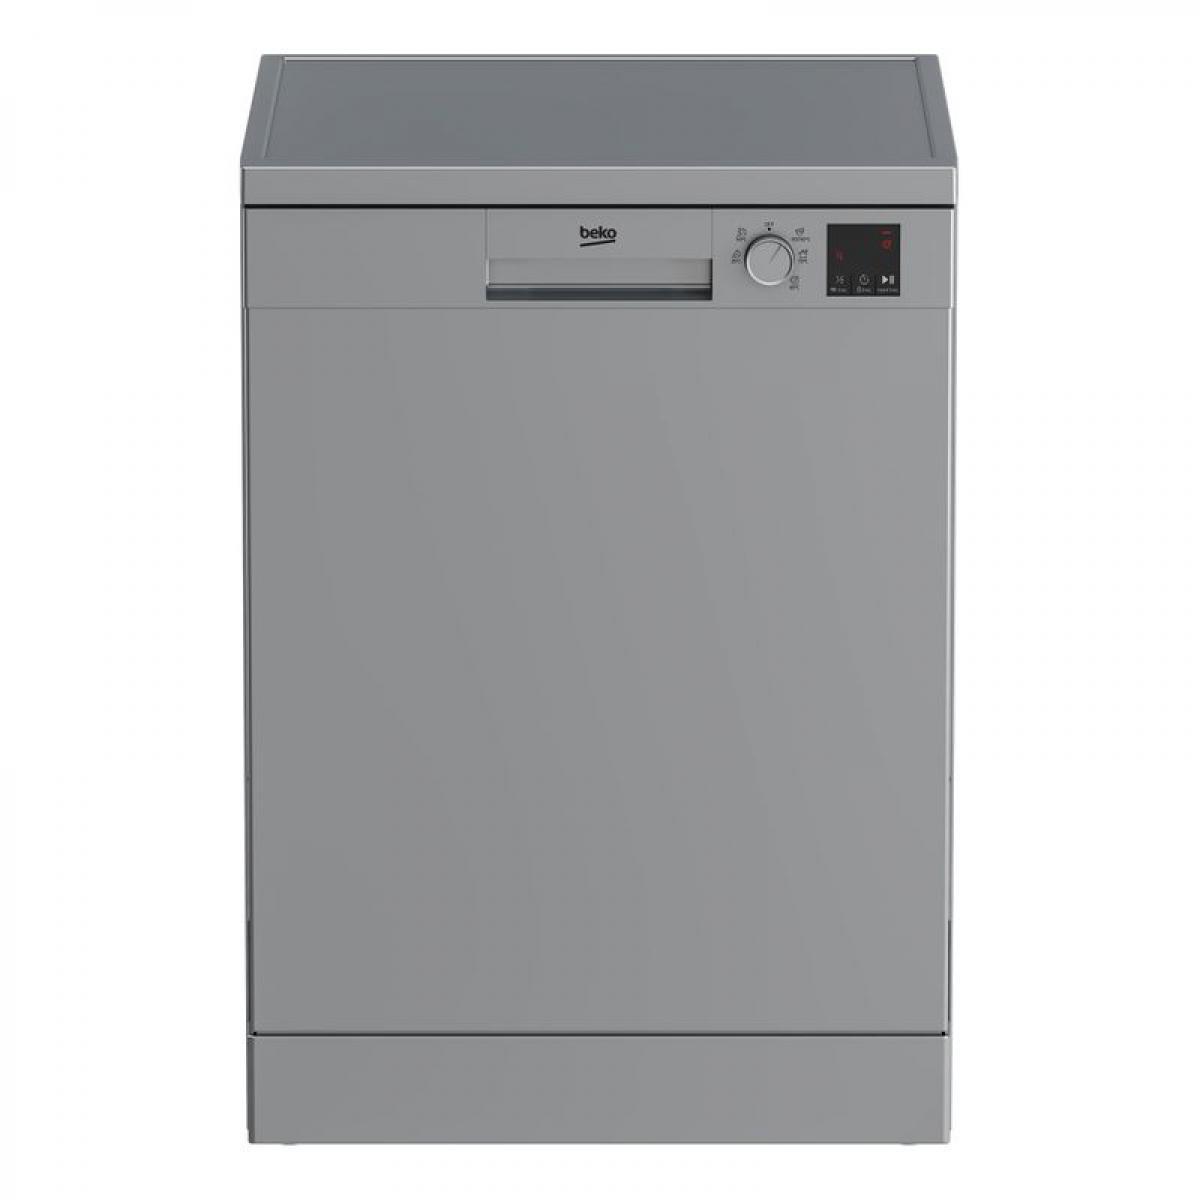 Beko Lave-vaisselle BEKO LVV4729S 14 couverts silver